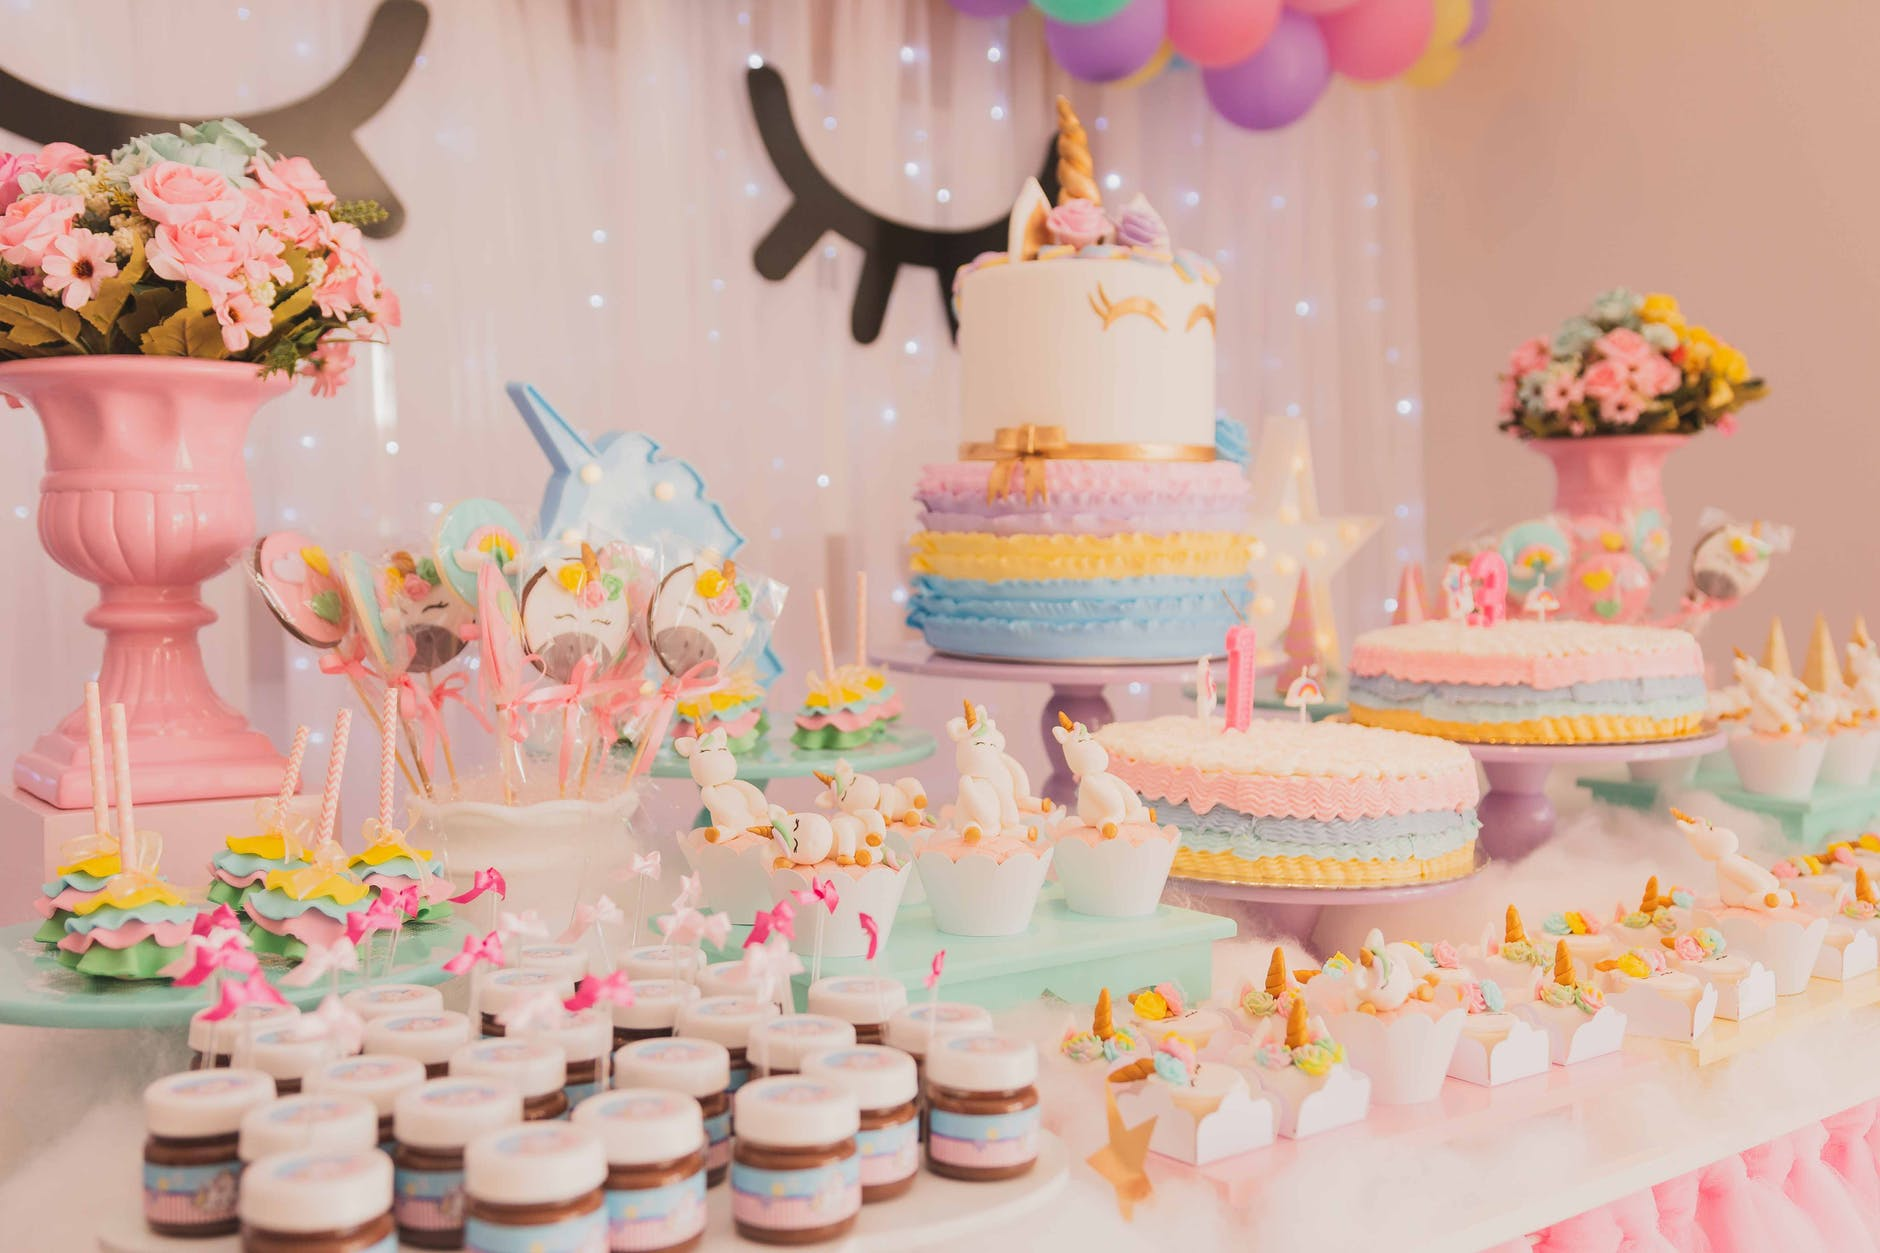 An assortment of birthday cakes.